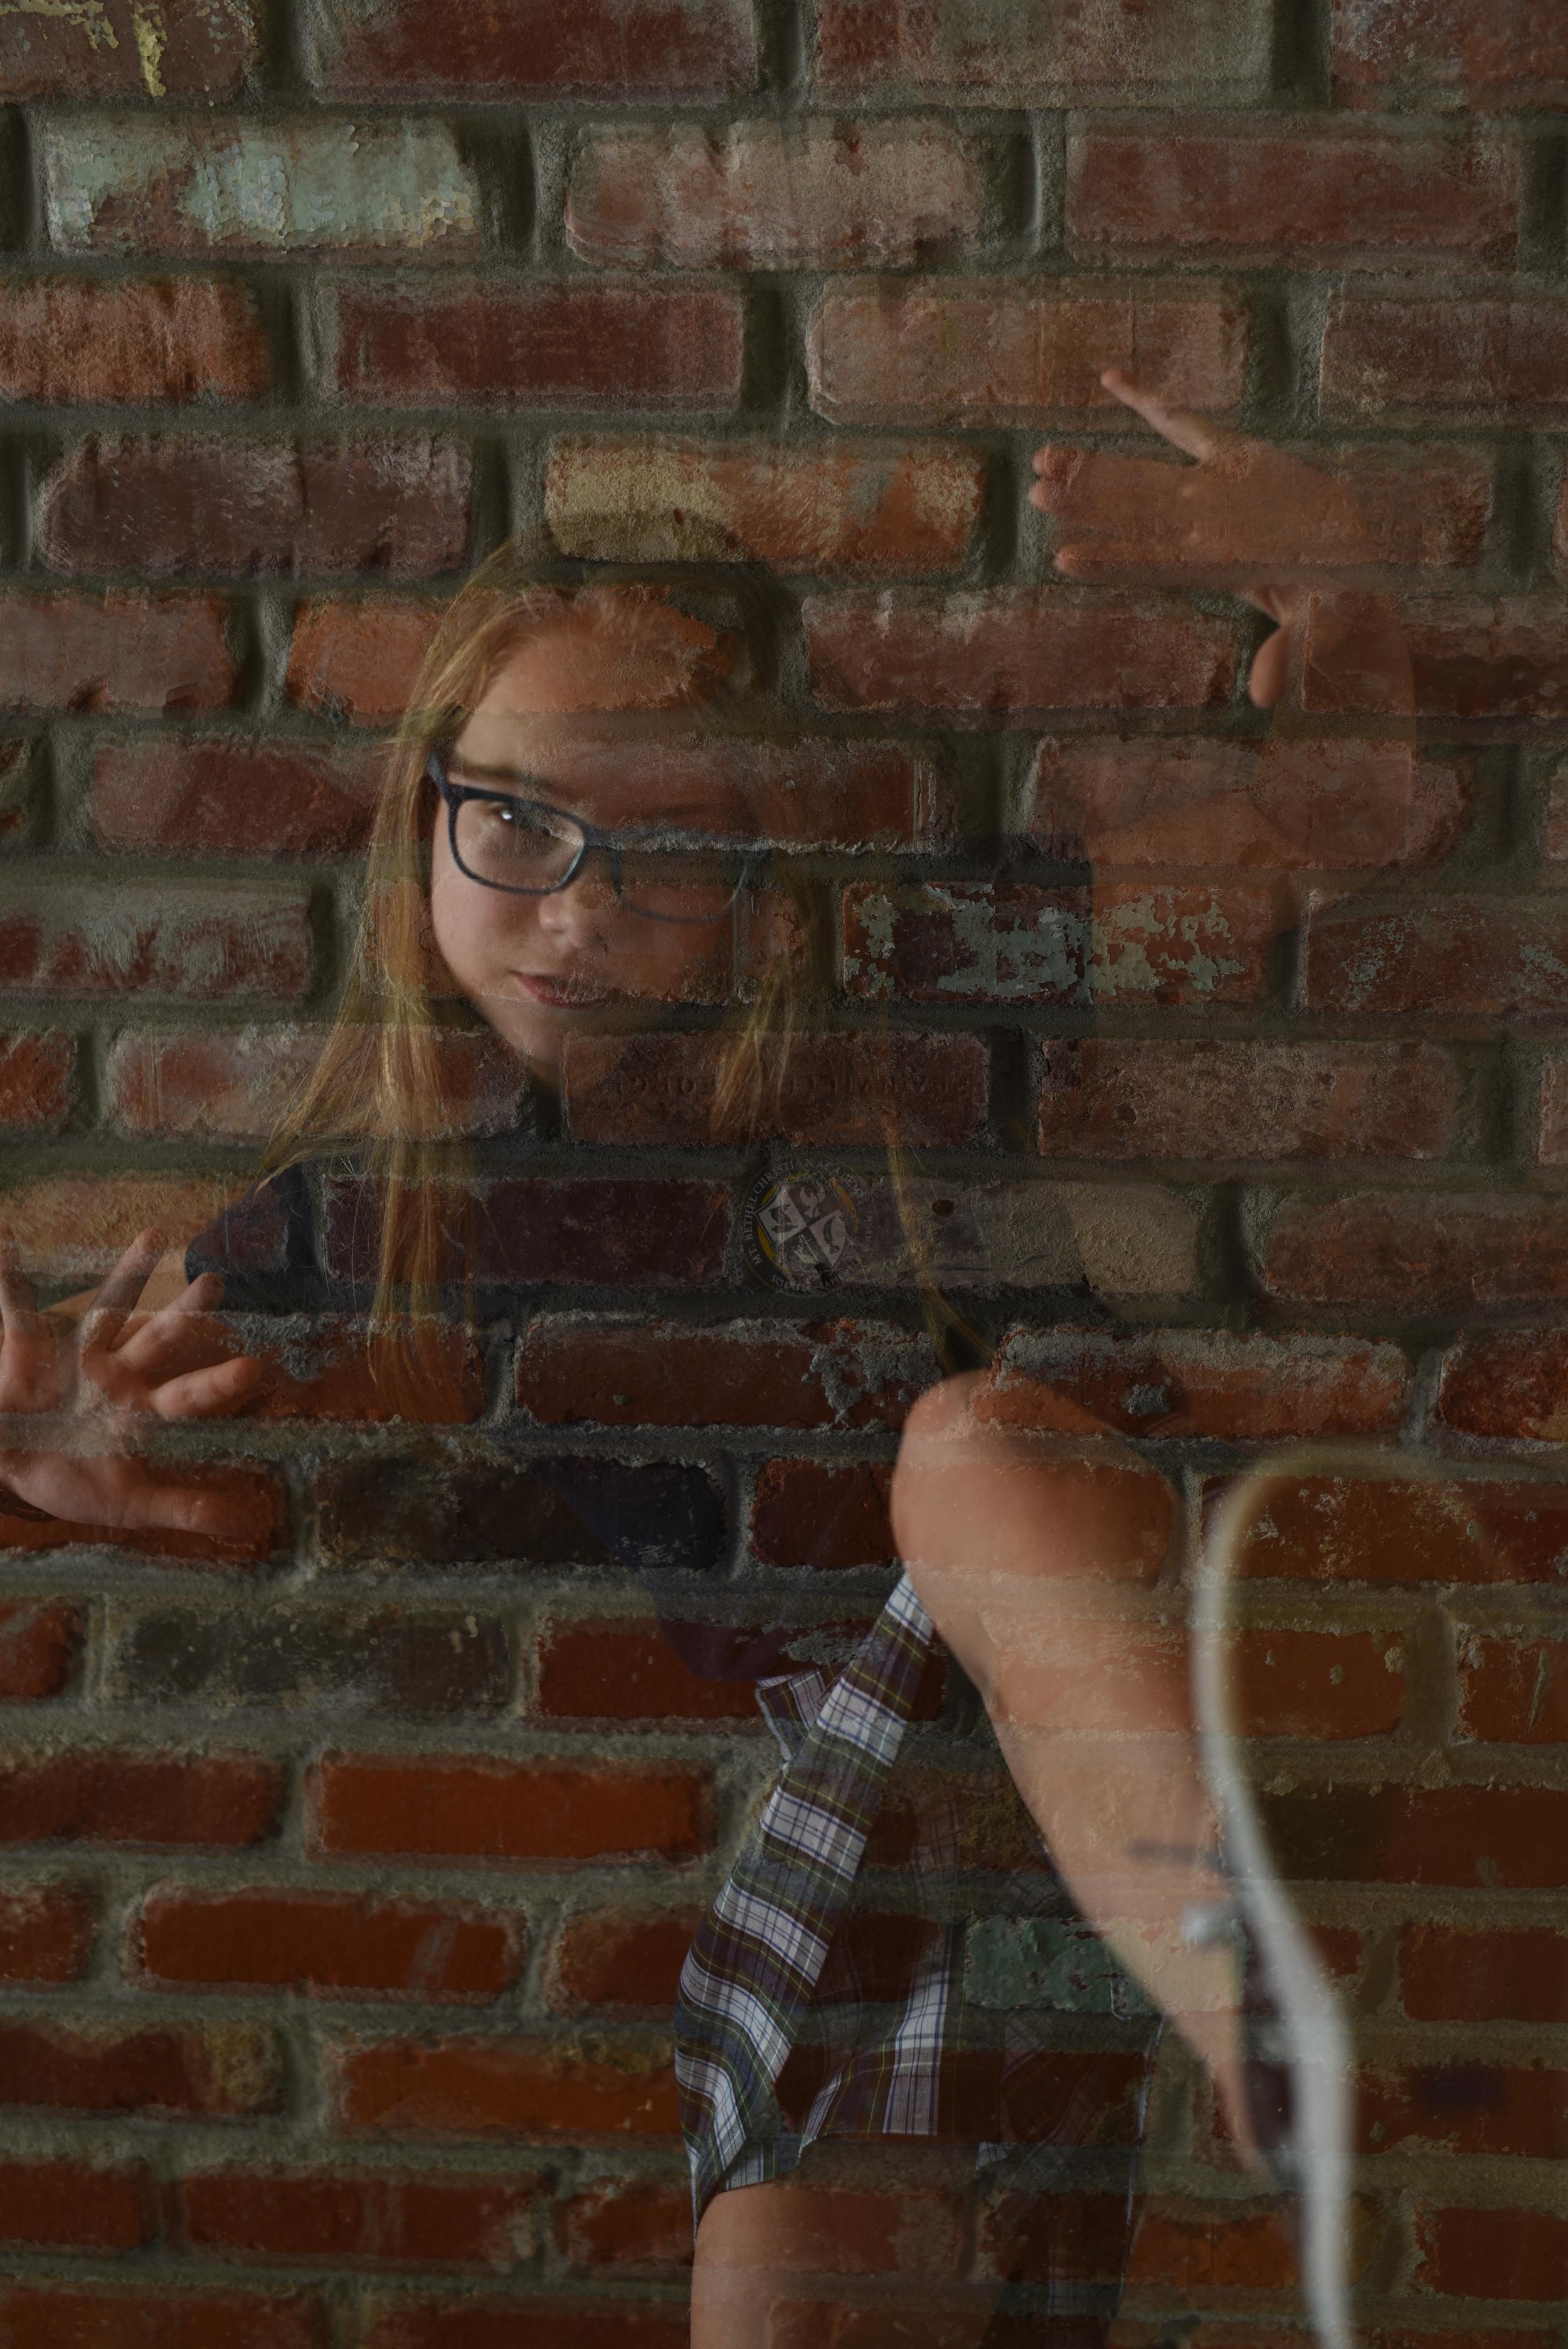 girl-breaking-out-of-bricks.jpg